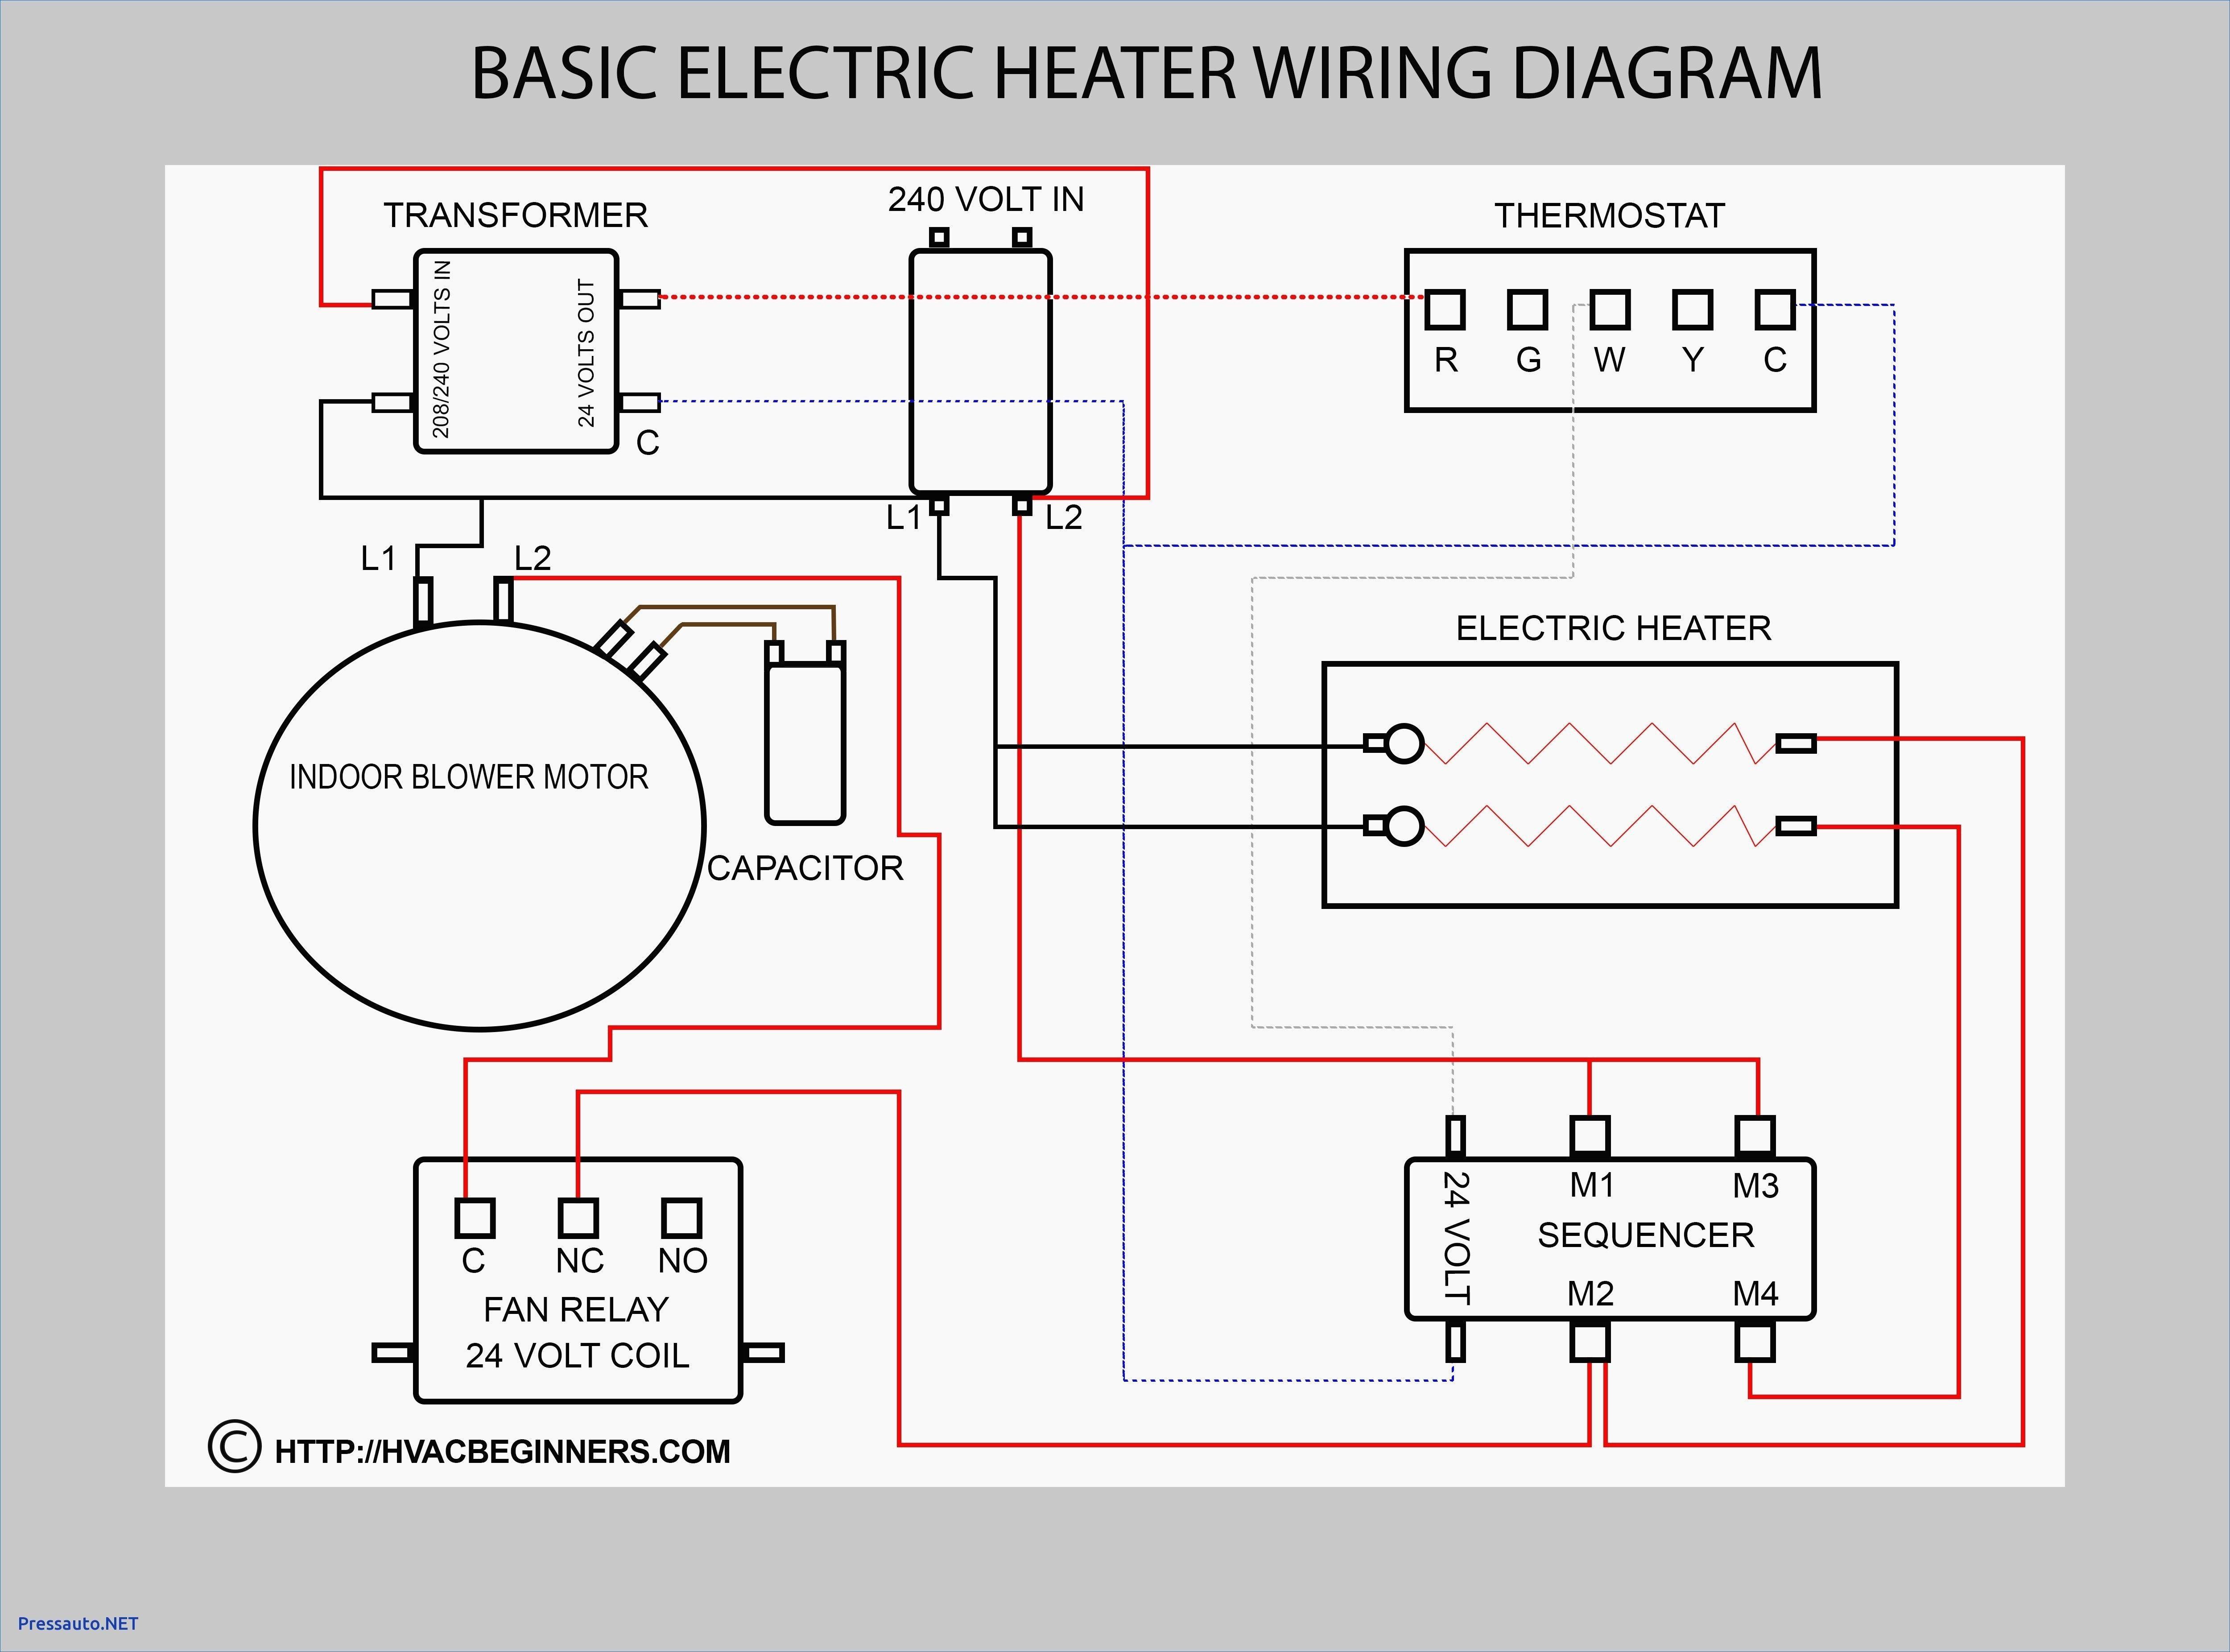 Electric Heat Strip Wiring Diagram In 2020 Electrical Circuit Diagram Basic Electrical Wiring Electrical Diagram